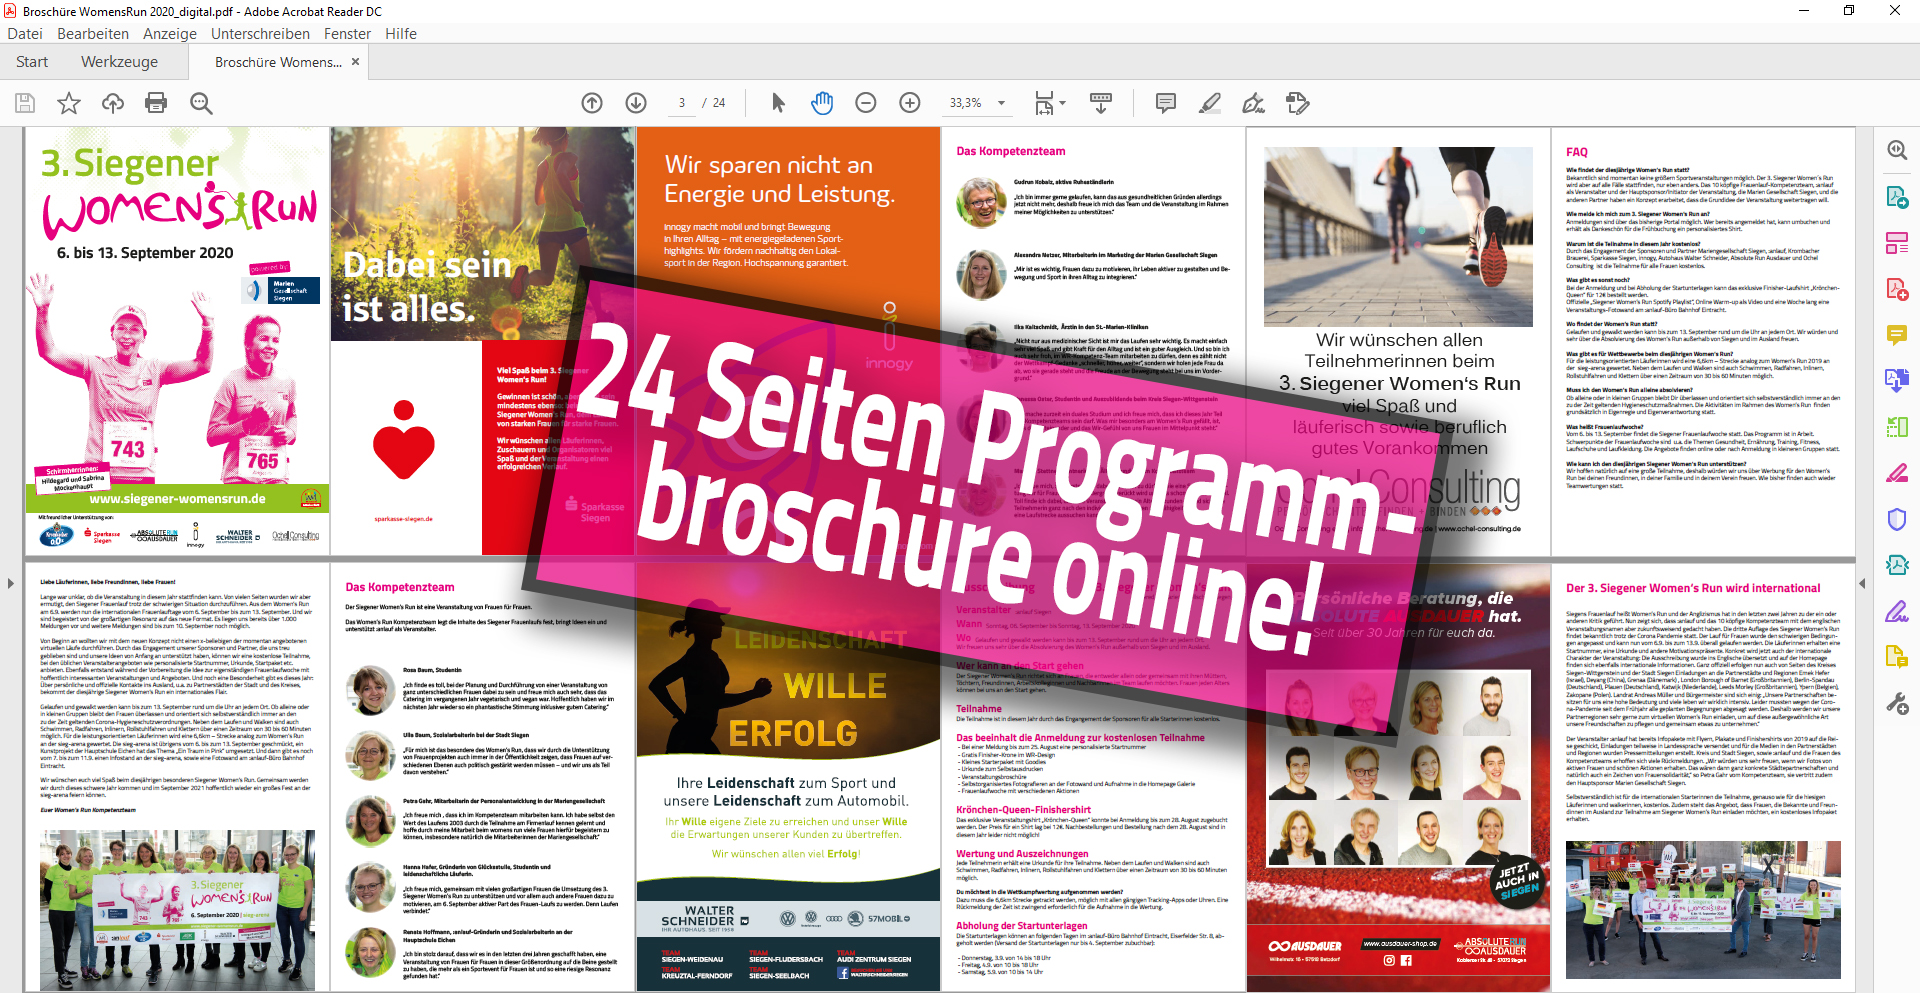 Programmbroschüre online!